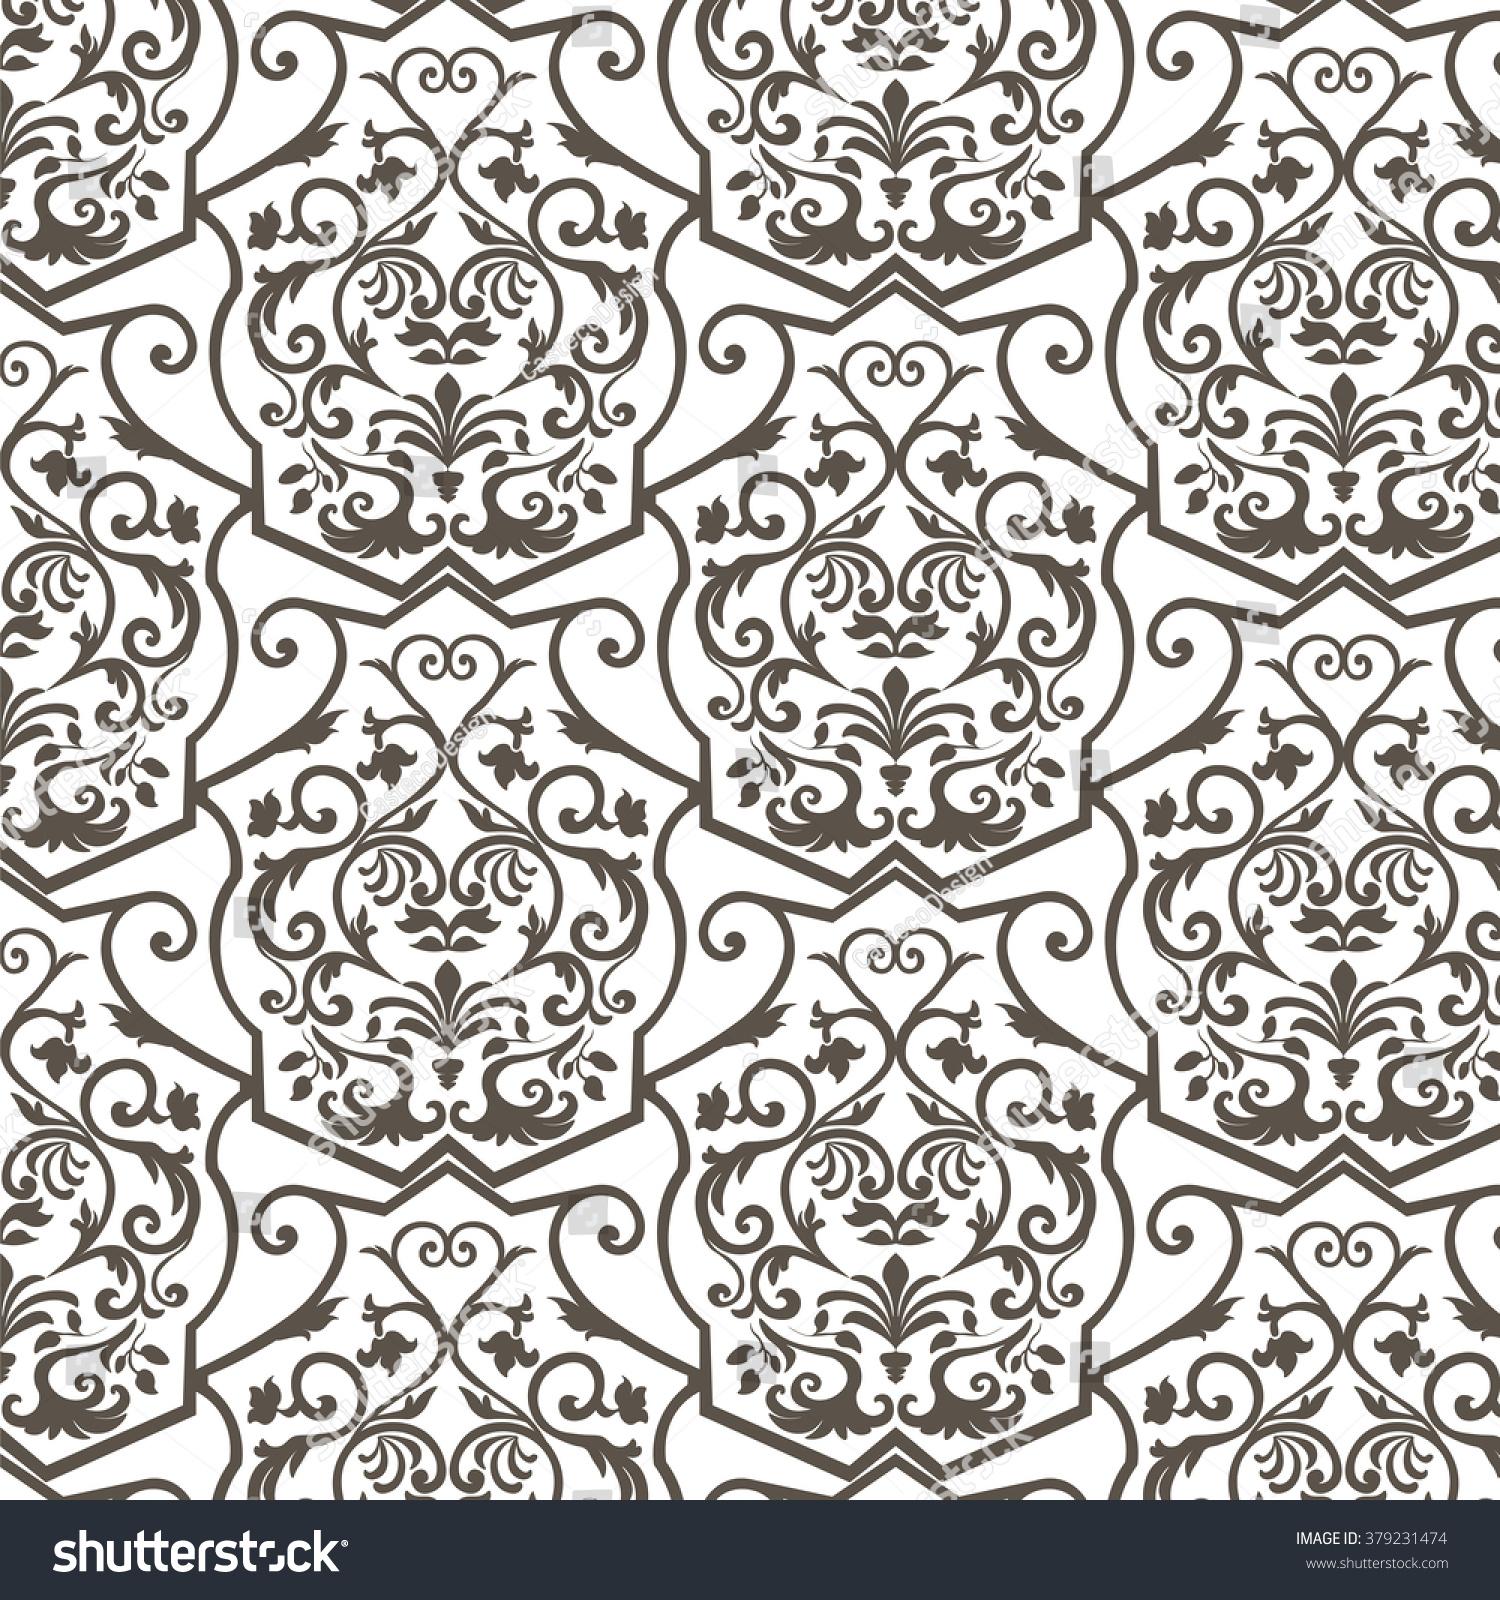 Vector Vintage Empire Motif Ornament Pattern Stock Vector ...